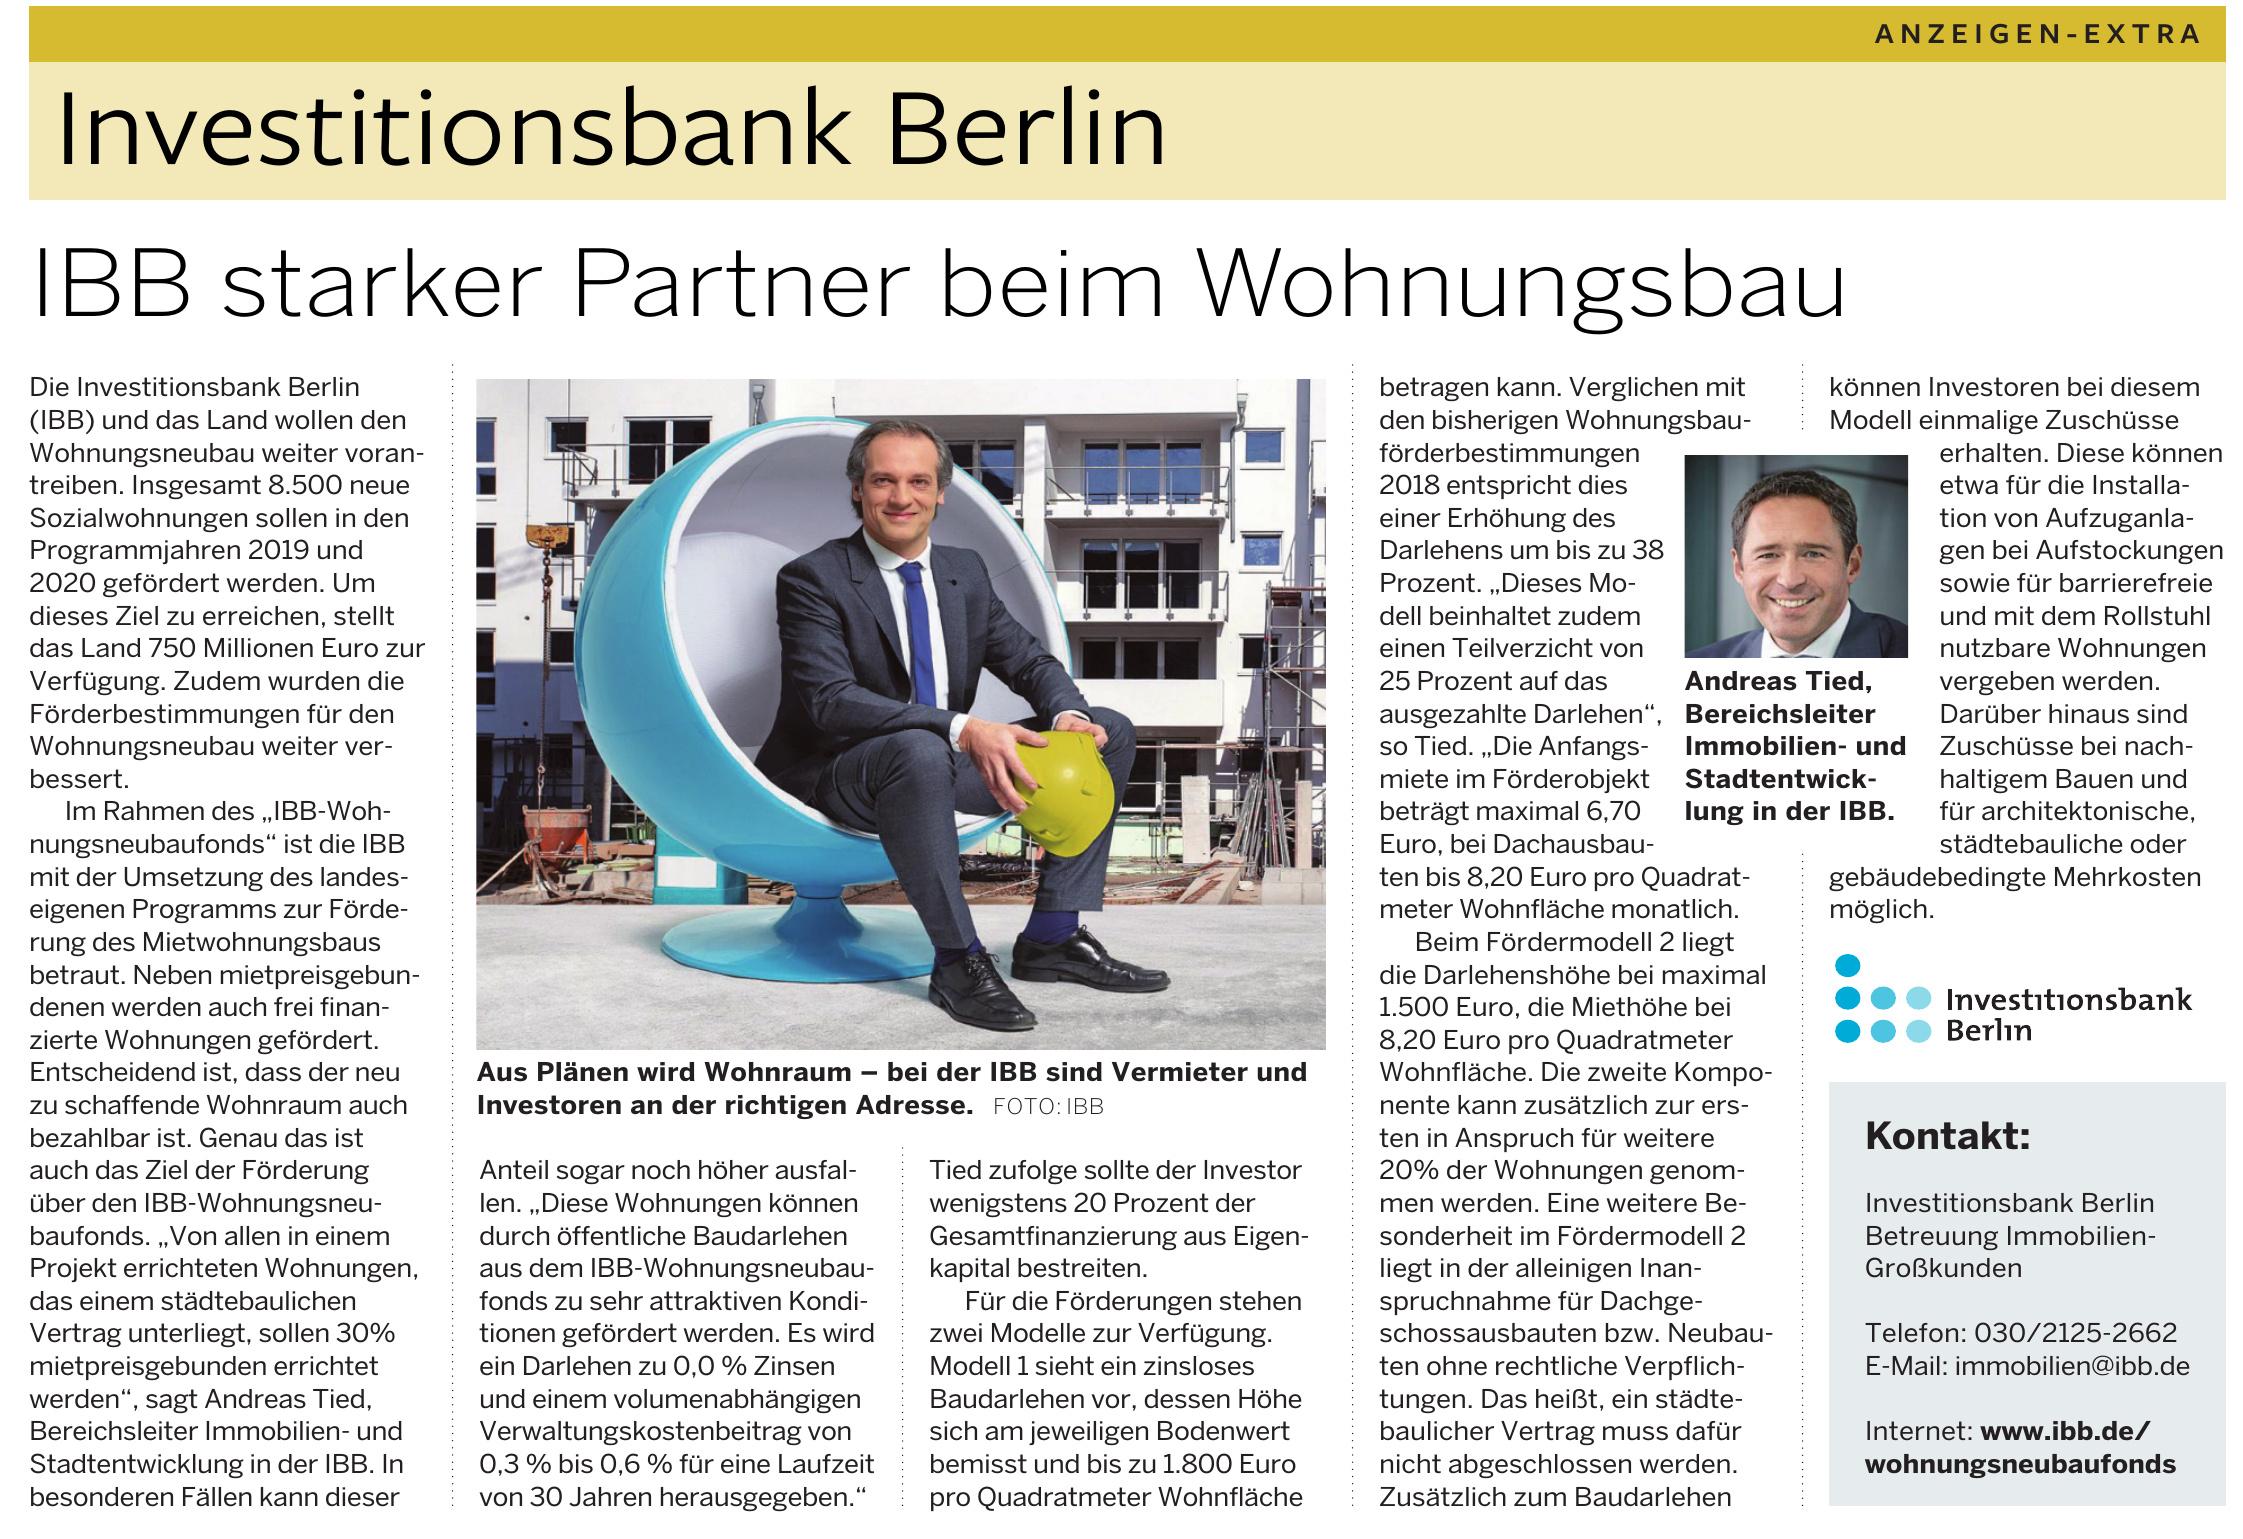 Investitionsbank Berlin Betreuung Immobilien-Großkunden